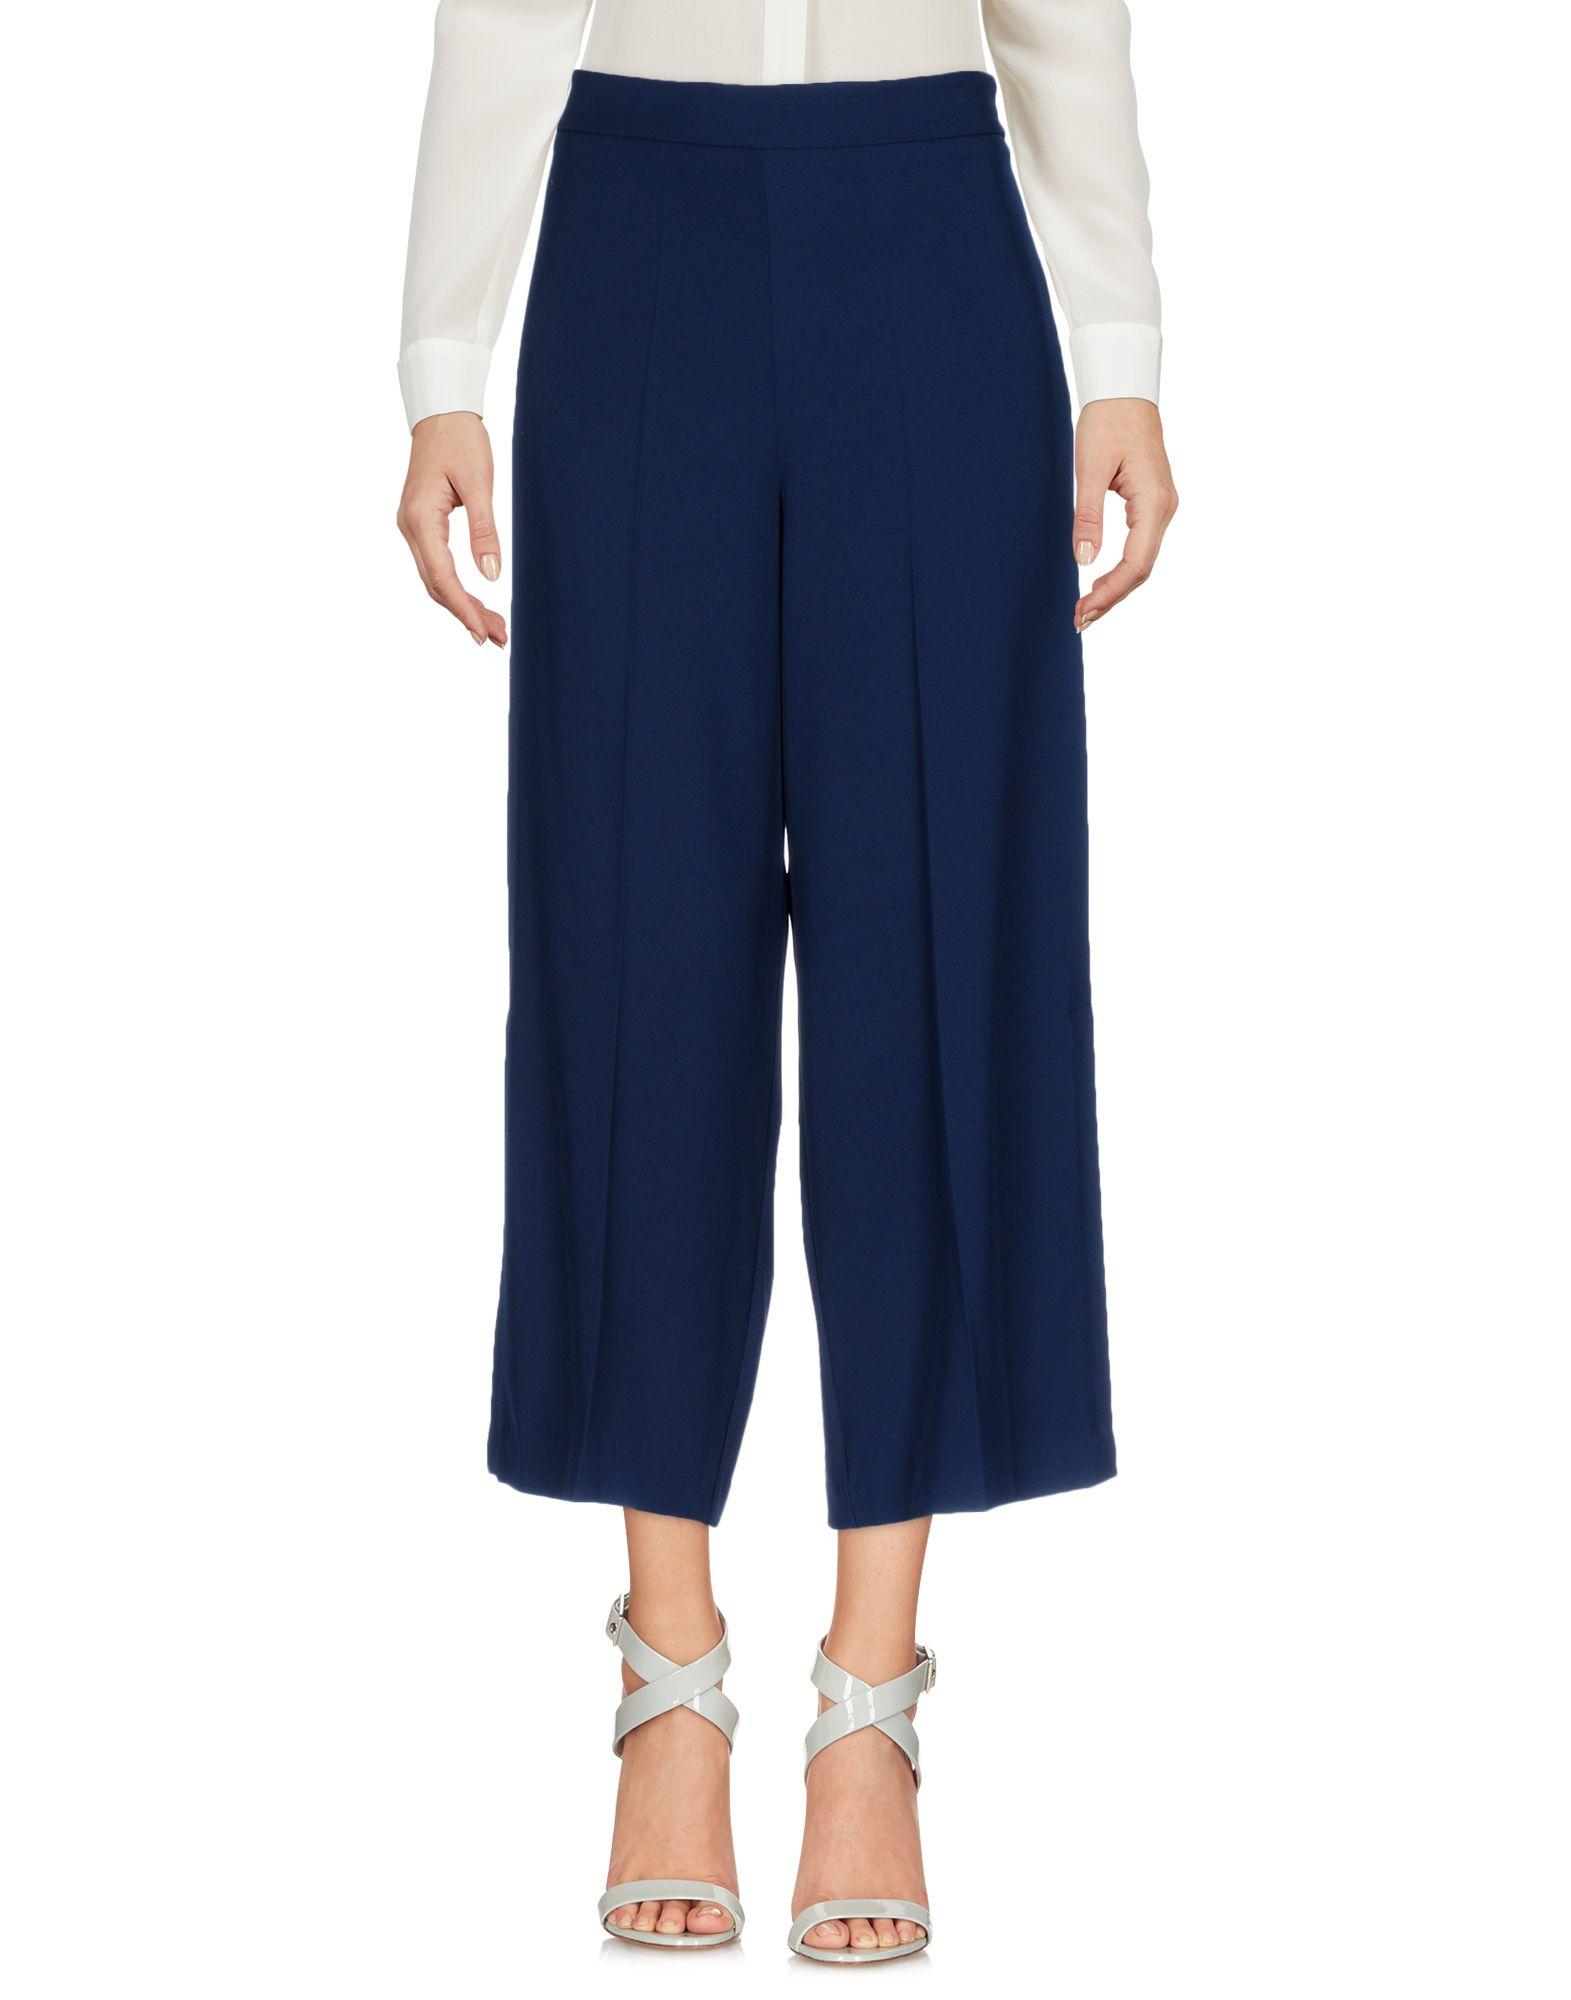 Pantalone Classico Try Me Donna - Acquista online su 8HCaKML